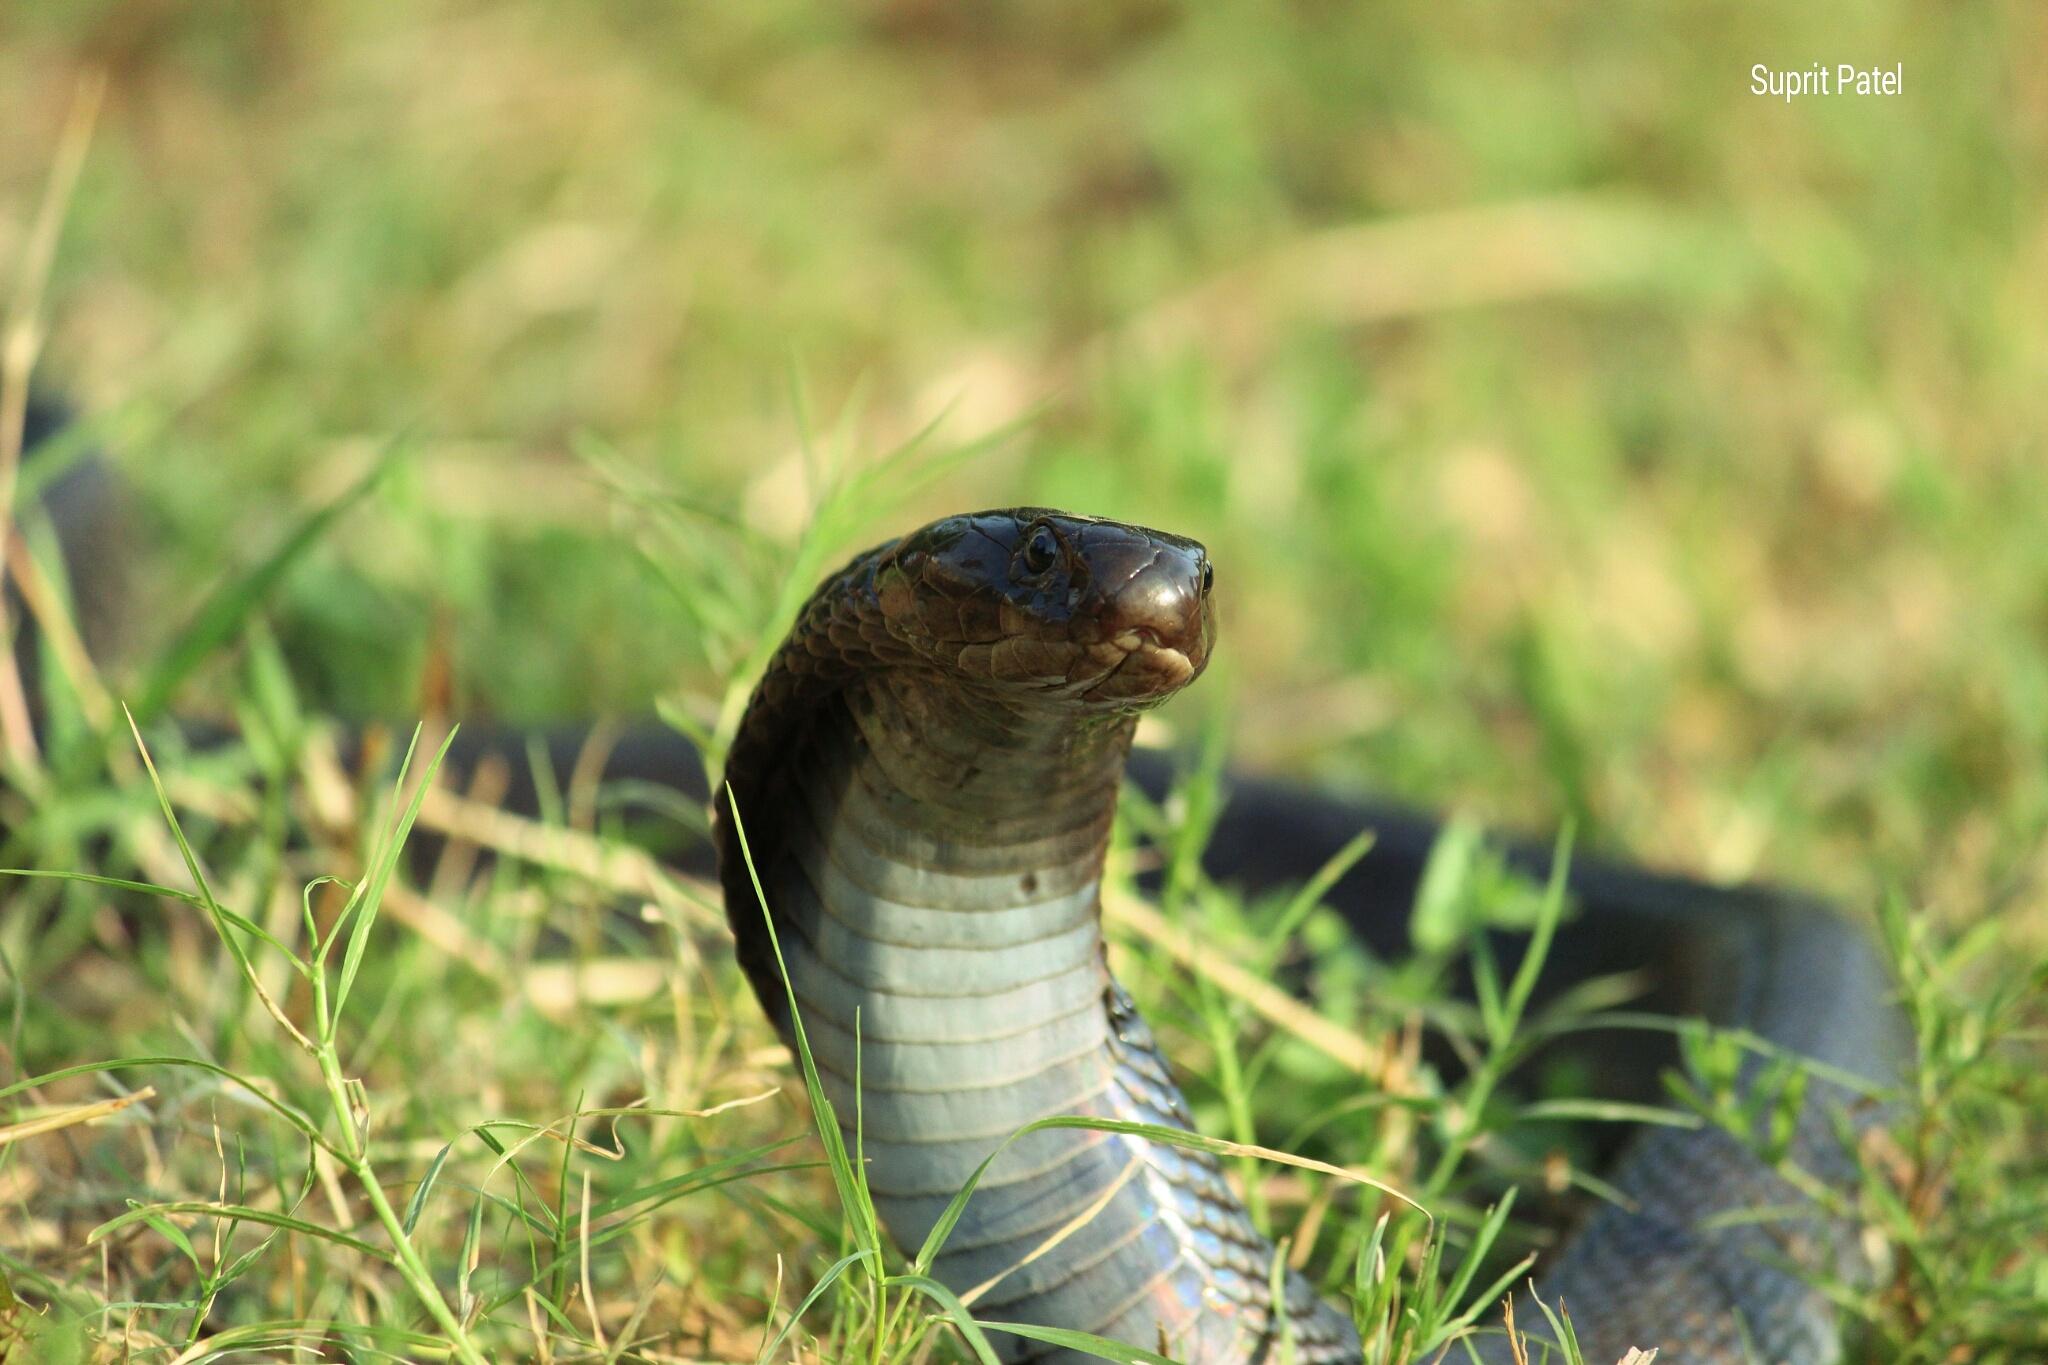 Cobra by Suprit